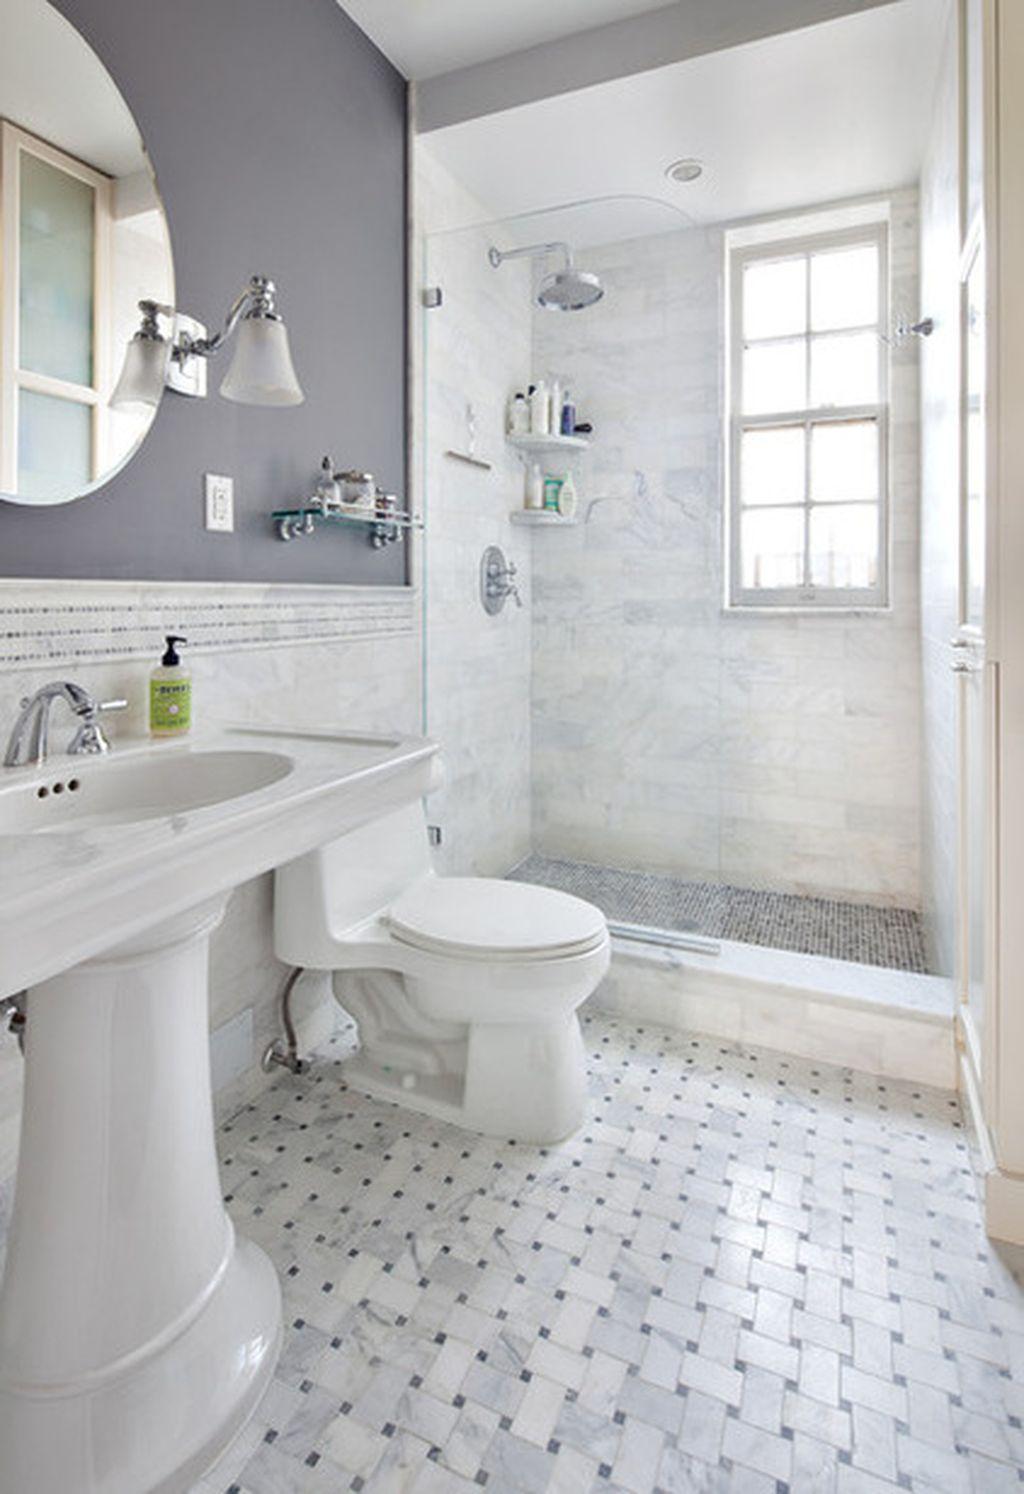 Bathroom Remodeling Minimalist 67 fantastic minimalist white bathroom remodel ideas | white